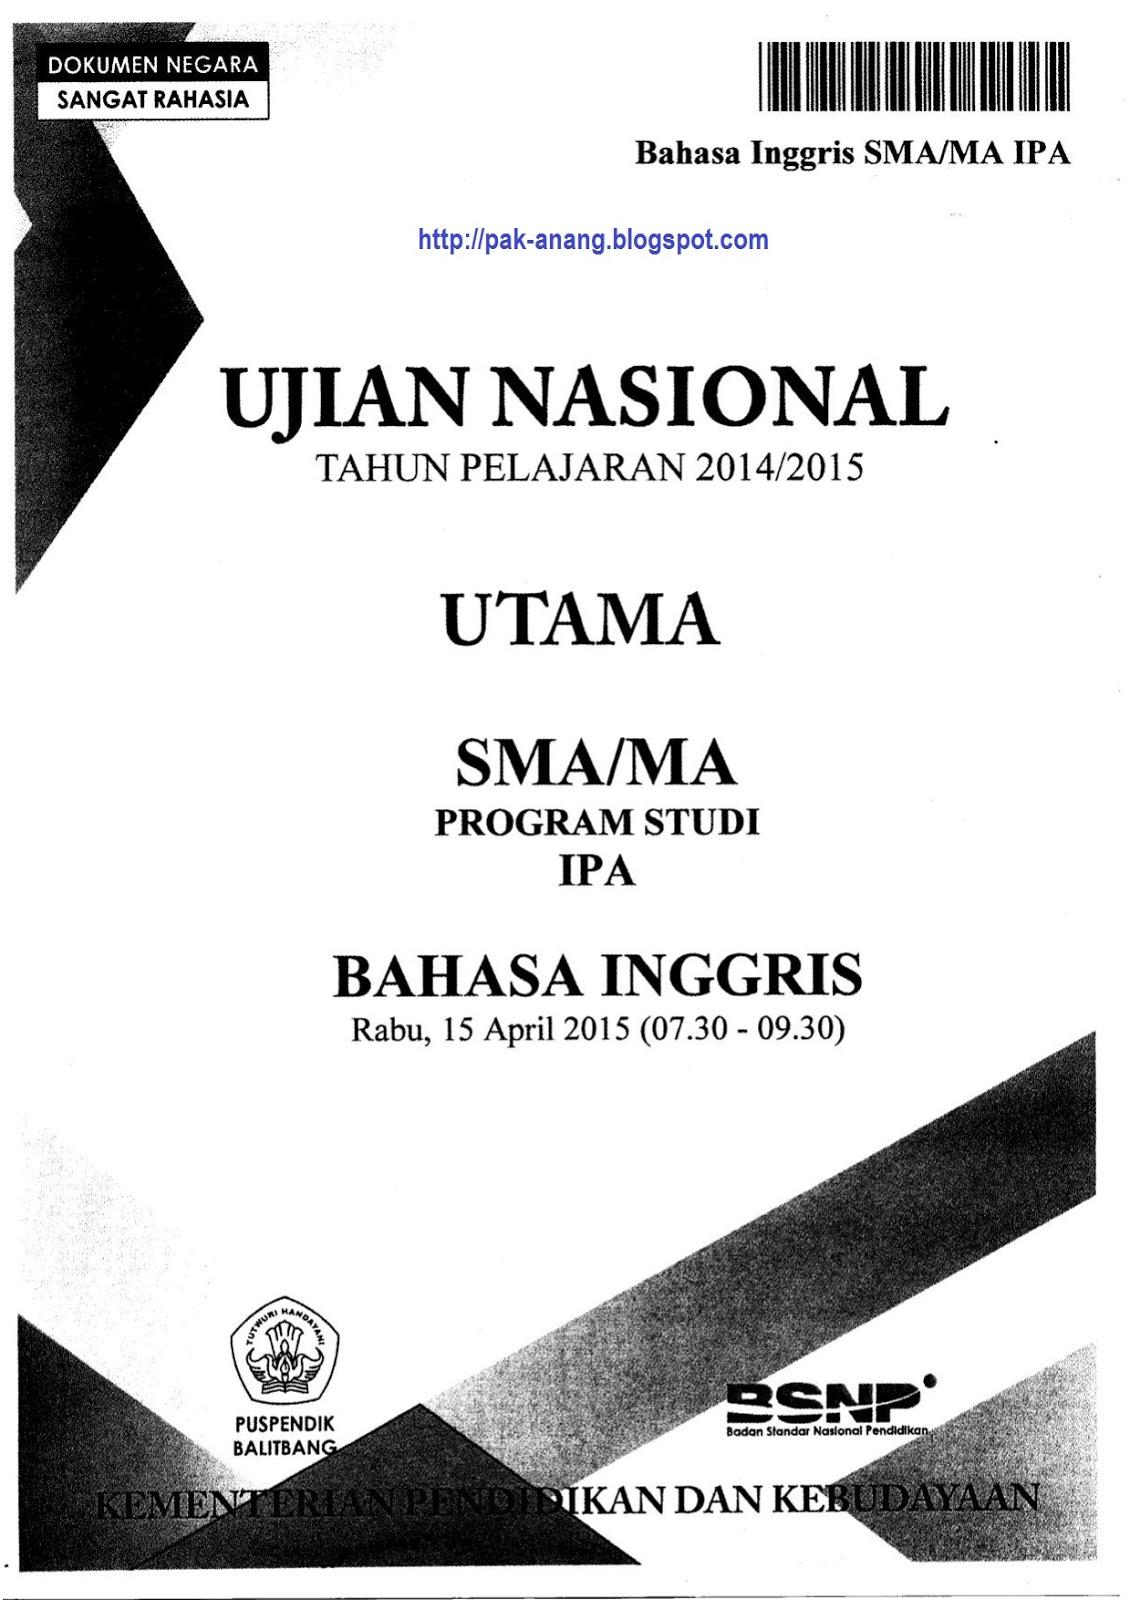 Paket Soal Ujian Nasional 2016 Sma Latihan Soal Un Smk Ujian Nasional Un Utama Tahun Untuk